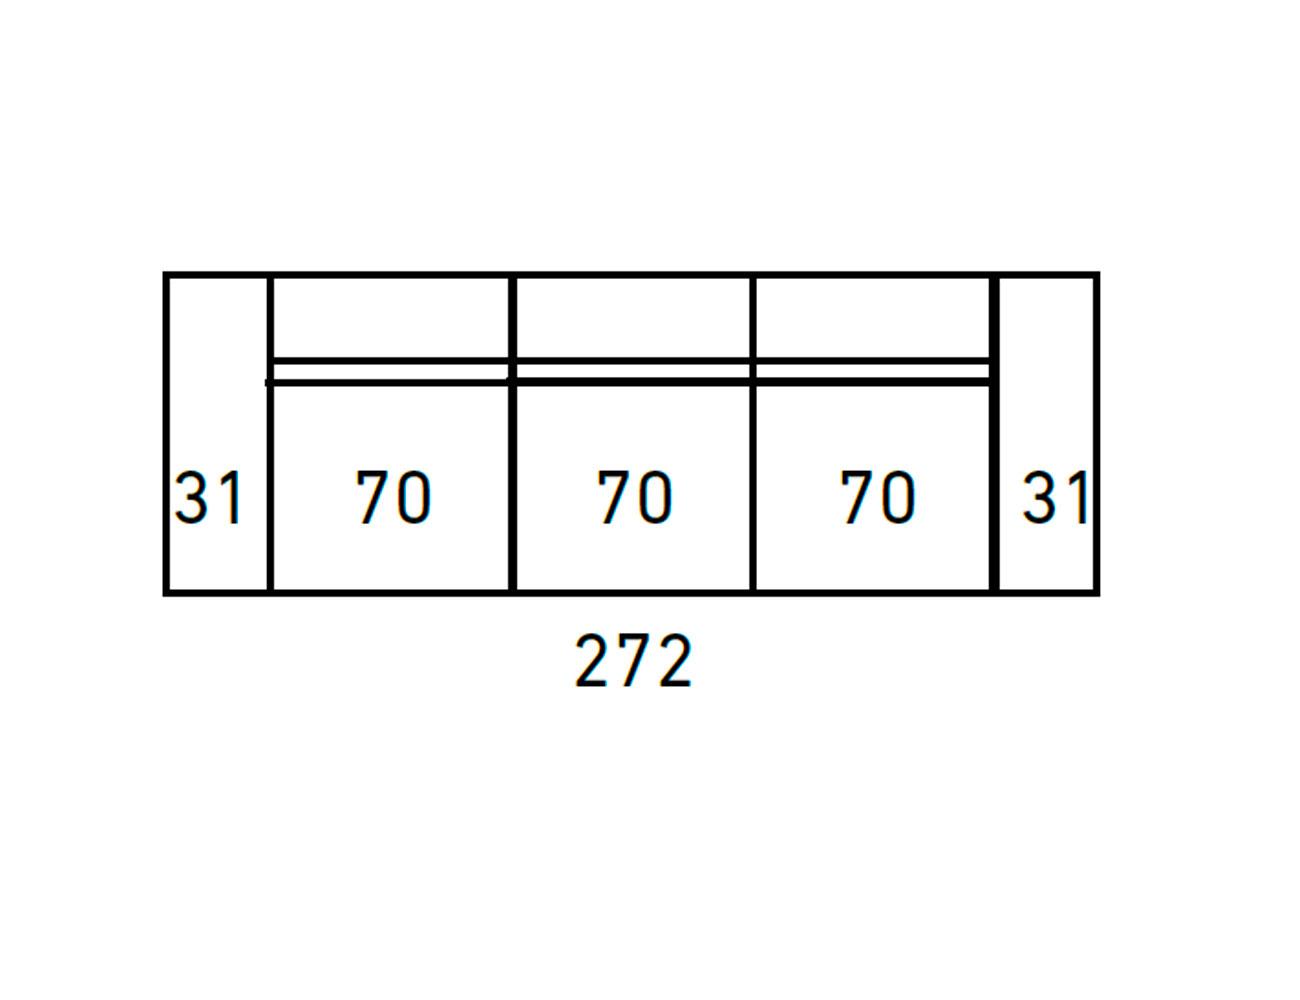 Sofa moderno 3 2 plazas anti manchas 33